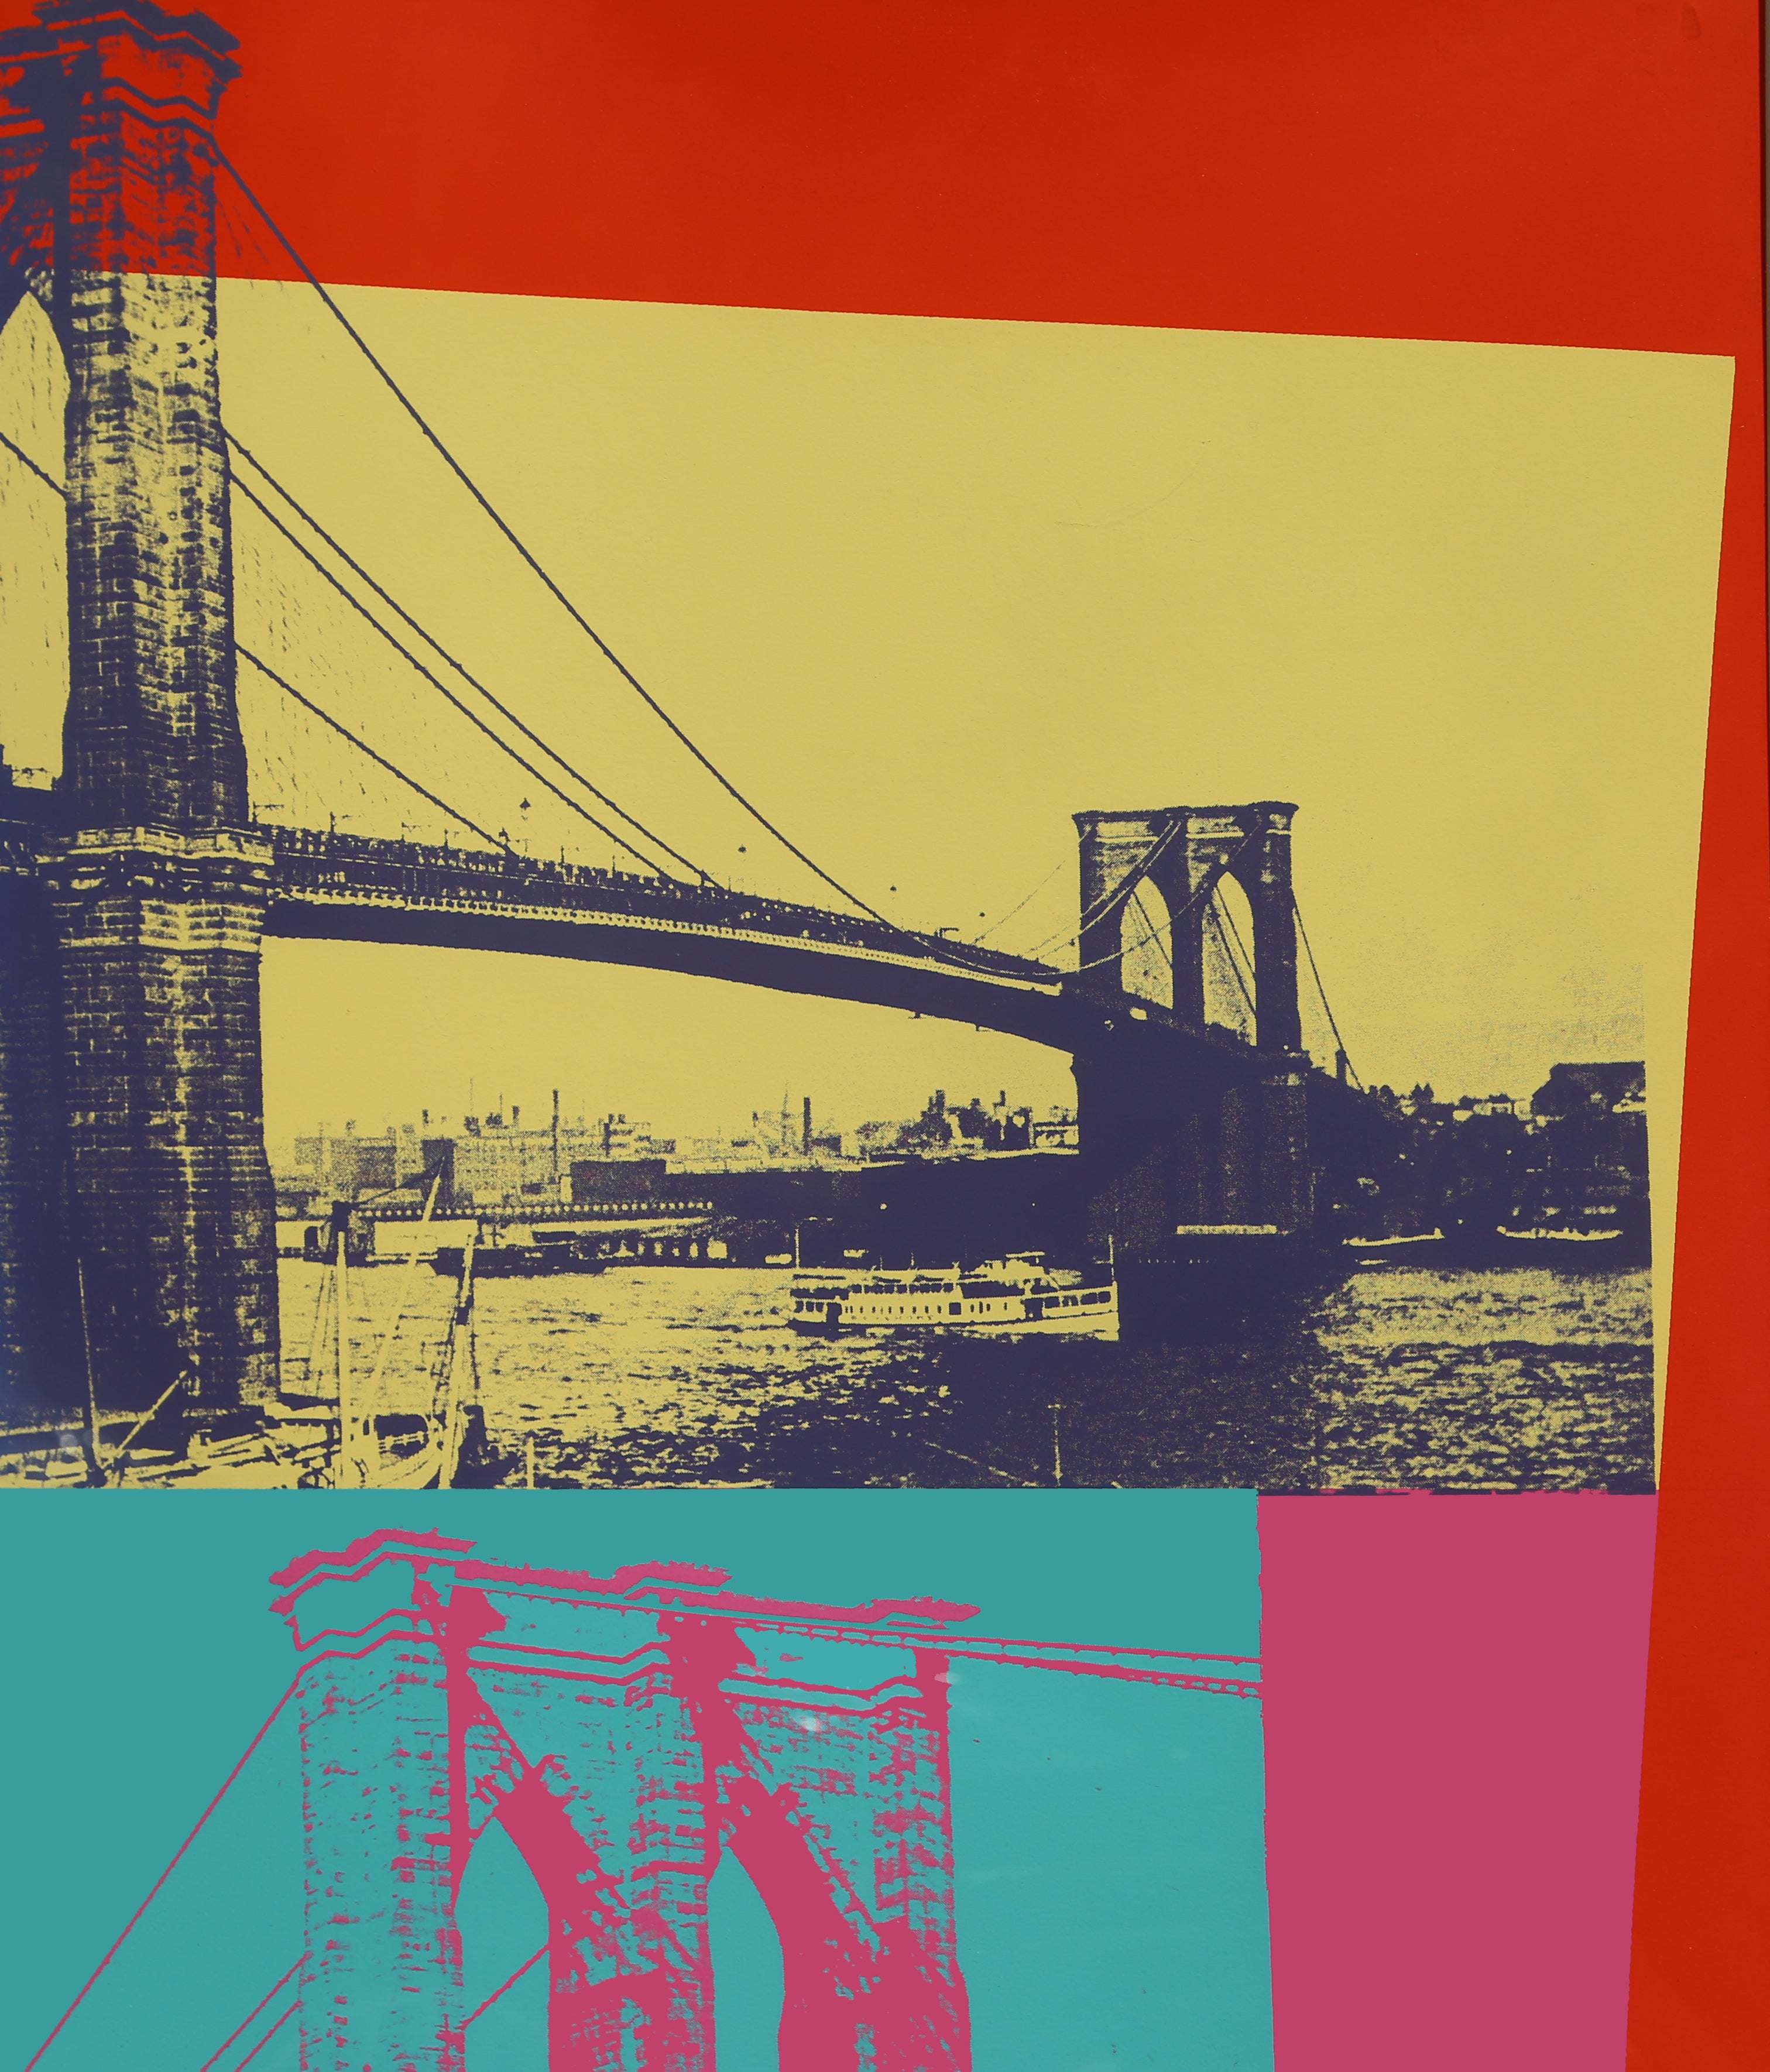 Andy Warhol - Brooklyn Bridge, FS.II.290, Screenprint by Andy Warhol ...